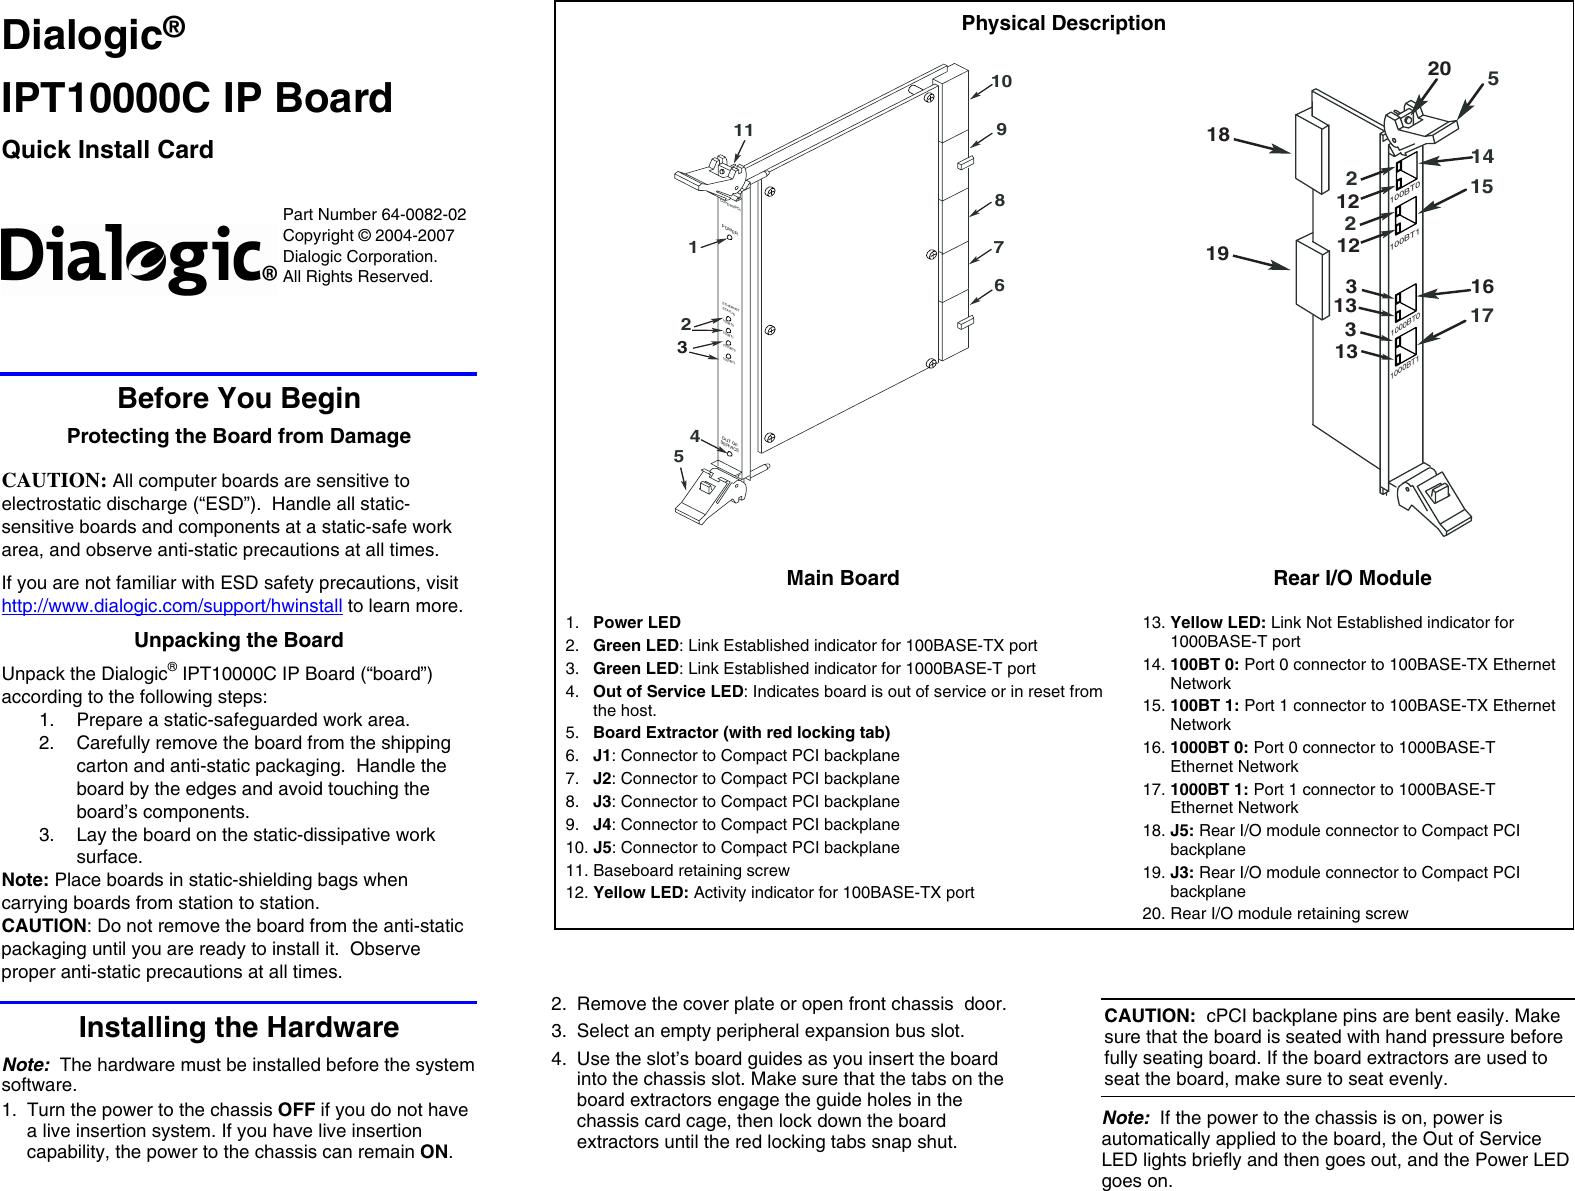 dialogic ip board ipt10000c users manual dm3 vfn series rh usermanual wiki Dialogic Reading Dialogic Linguistics